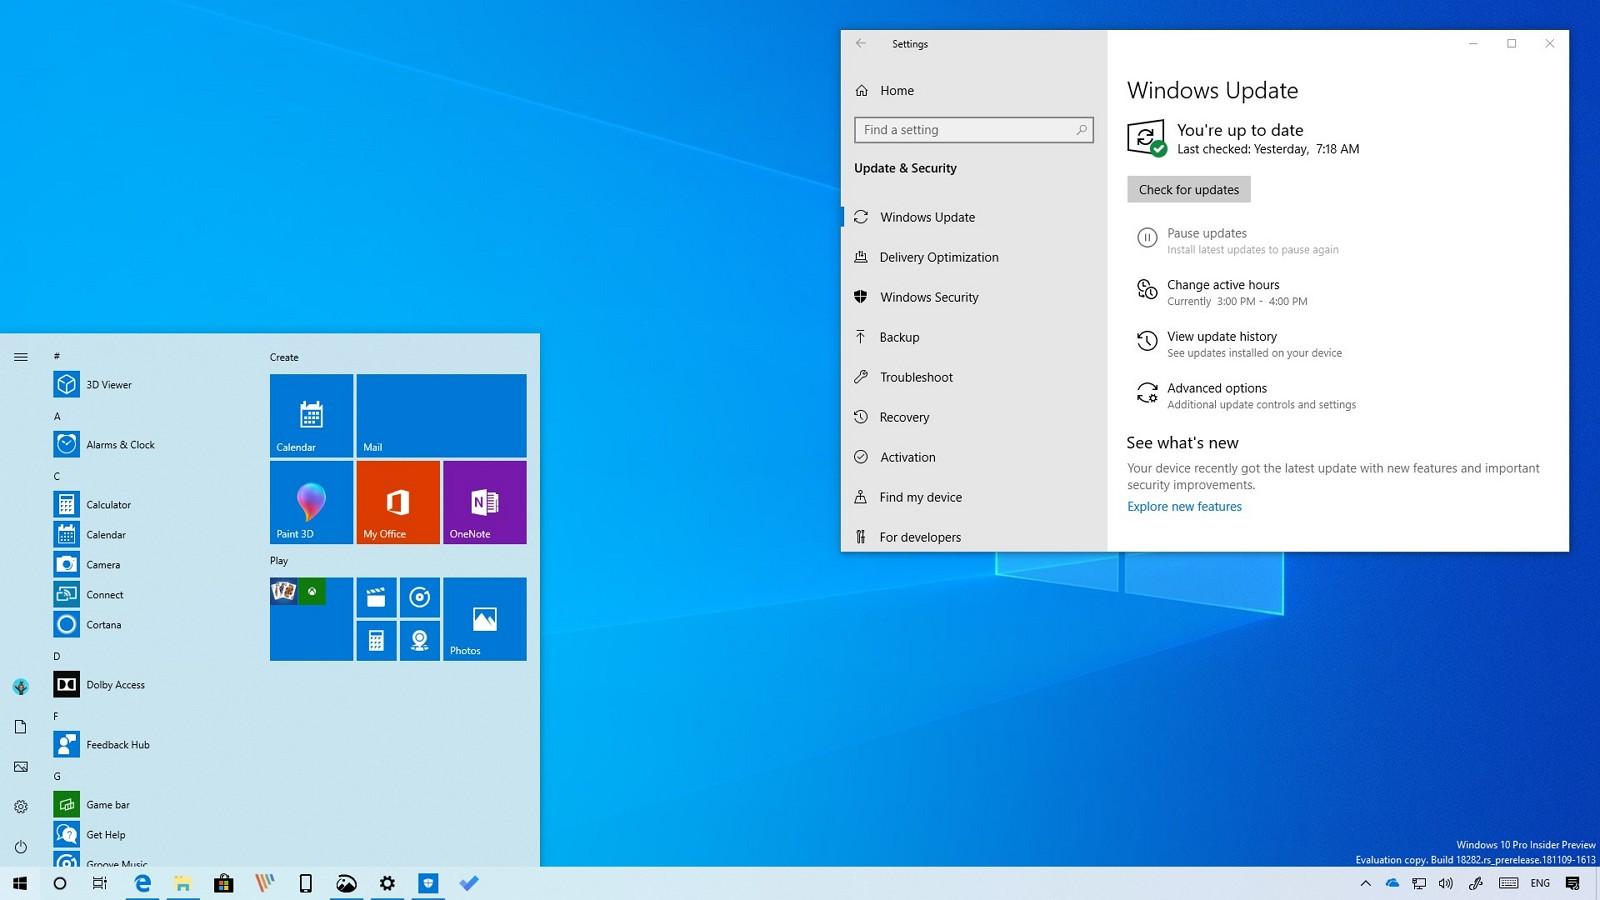 Windows 10 build 18282 with light theme